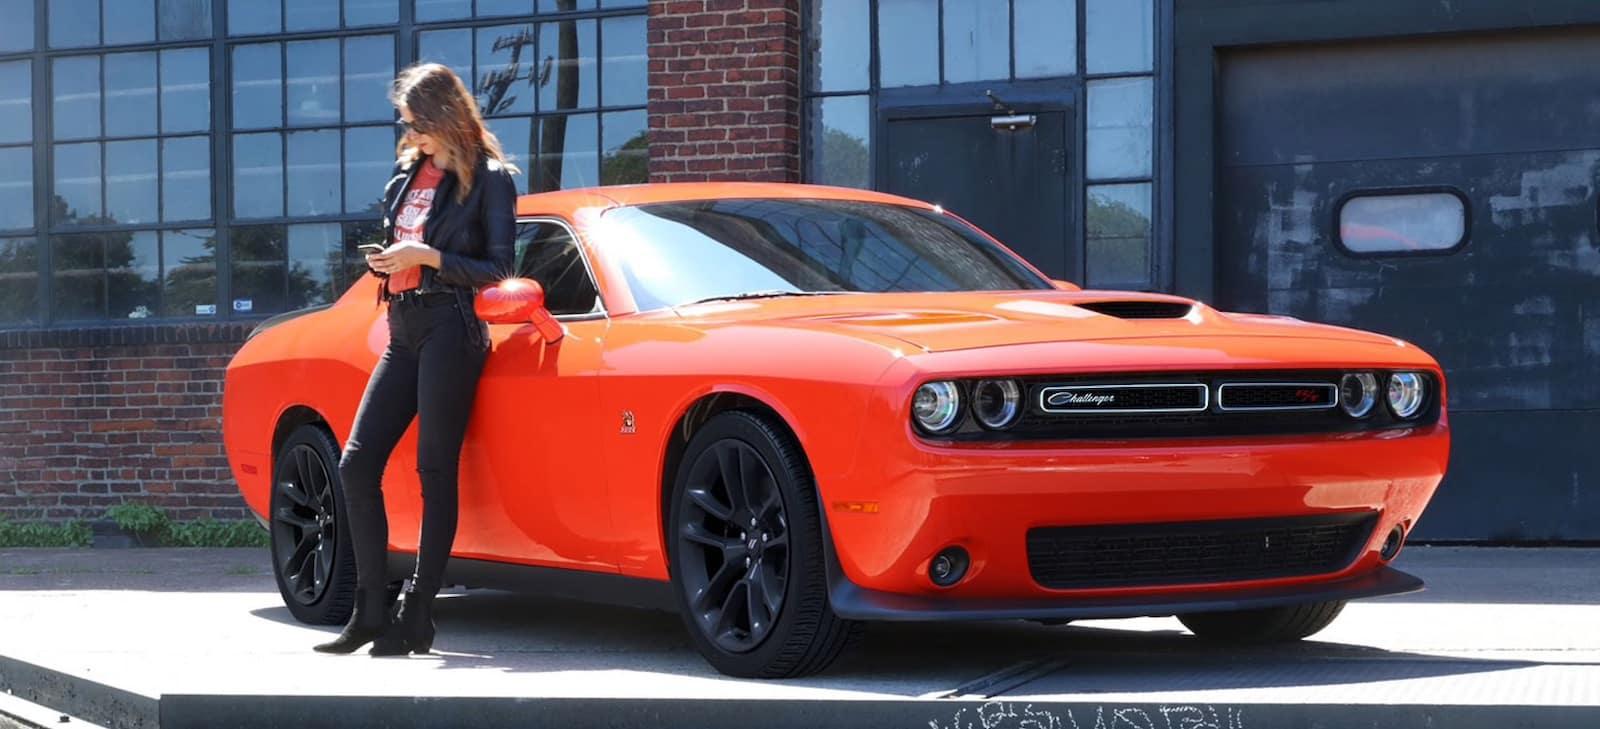 2021 Dodge Challenger exterior design